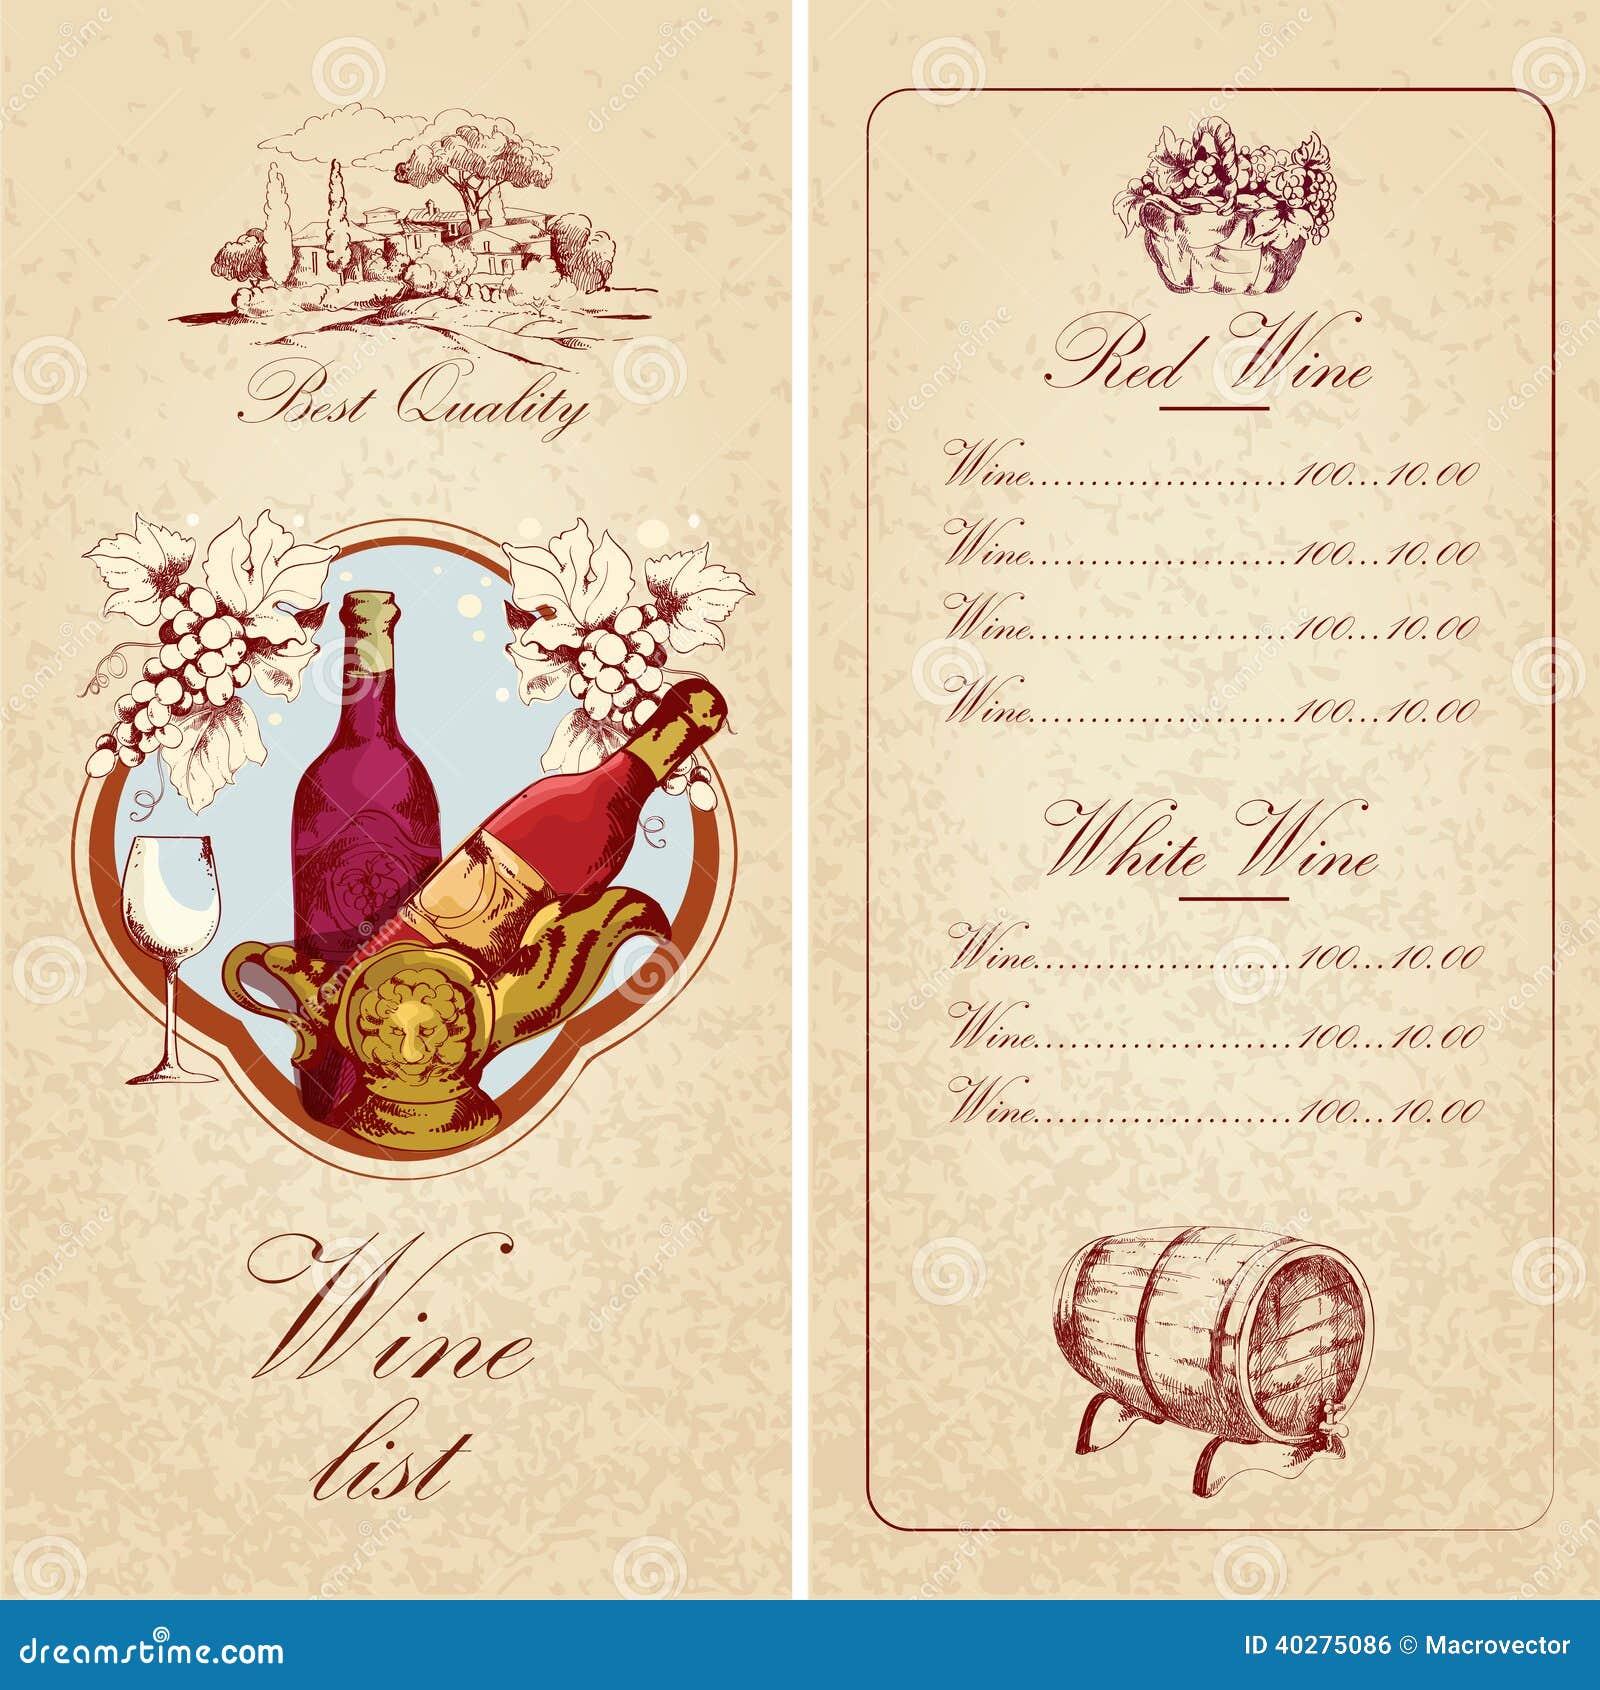 wine list template stock vector image 40275086. Black Bedroom Furniture Sets. Home Design Ideas